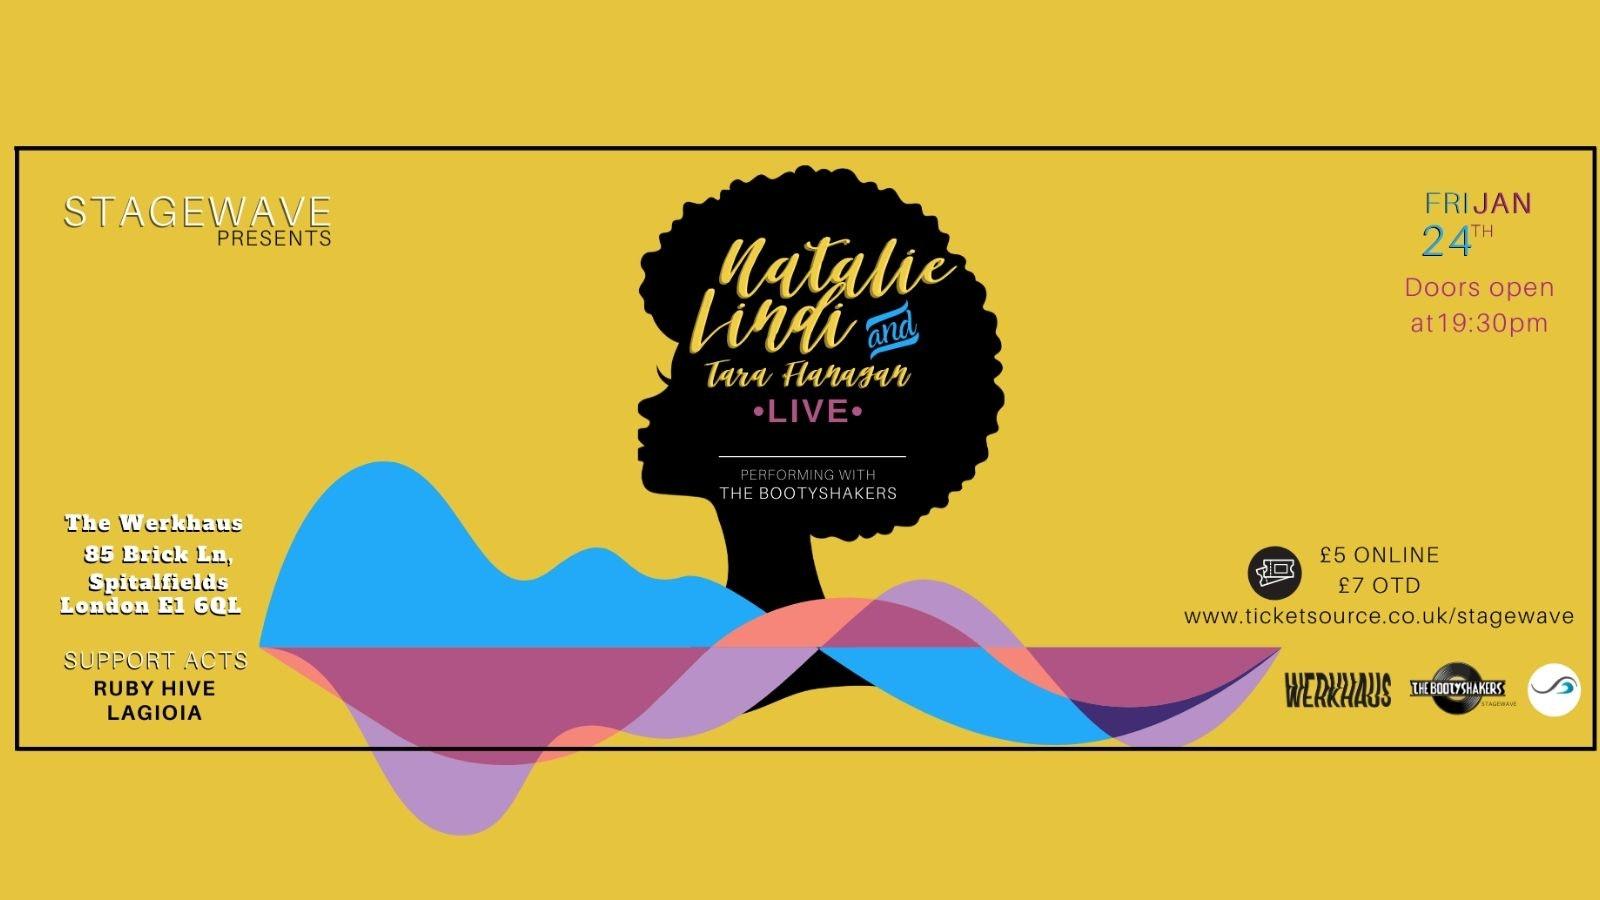 StageWave Presents: Natalie Lindi & Tara Flanagan